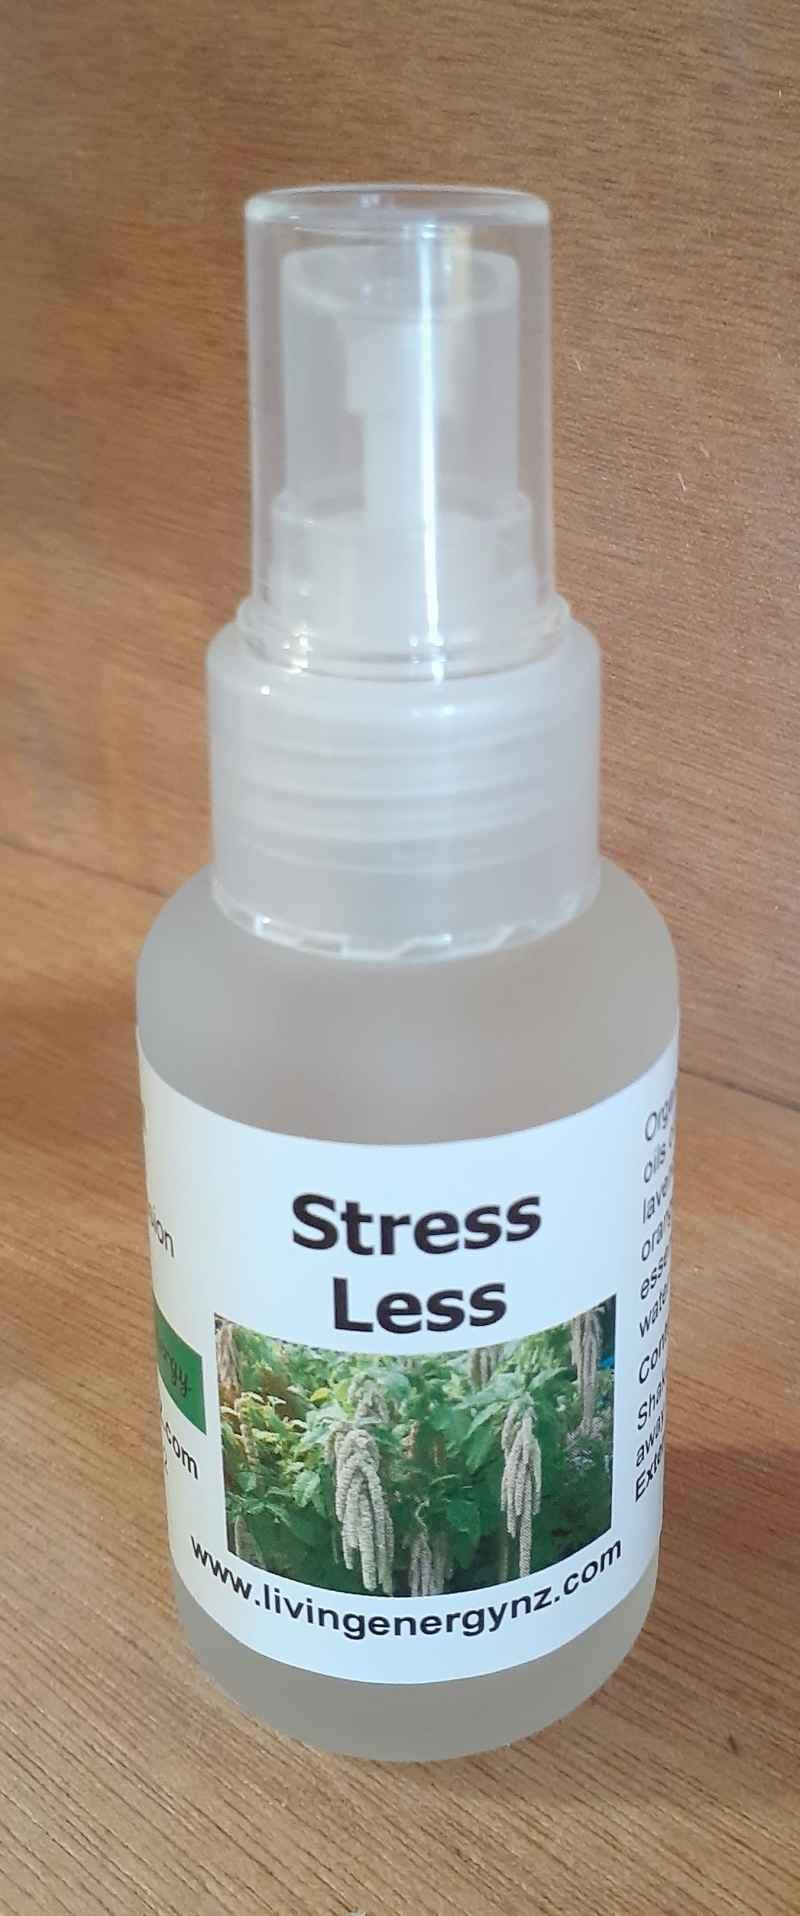 AROMATHERAPY SPRAY BLEND STRESS LESS